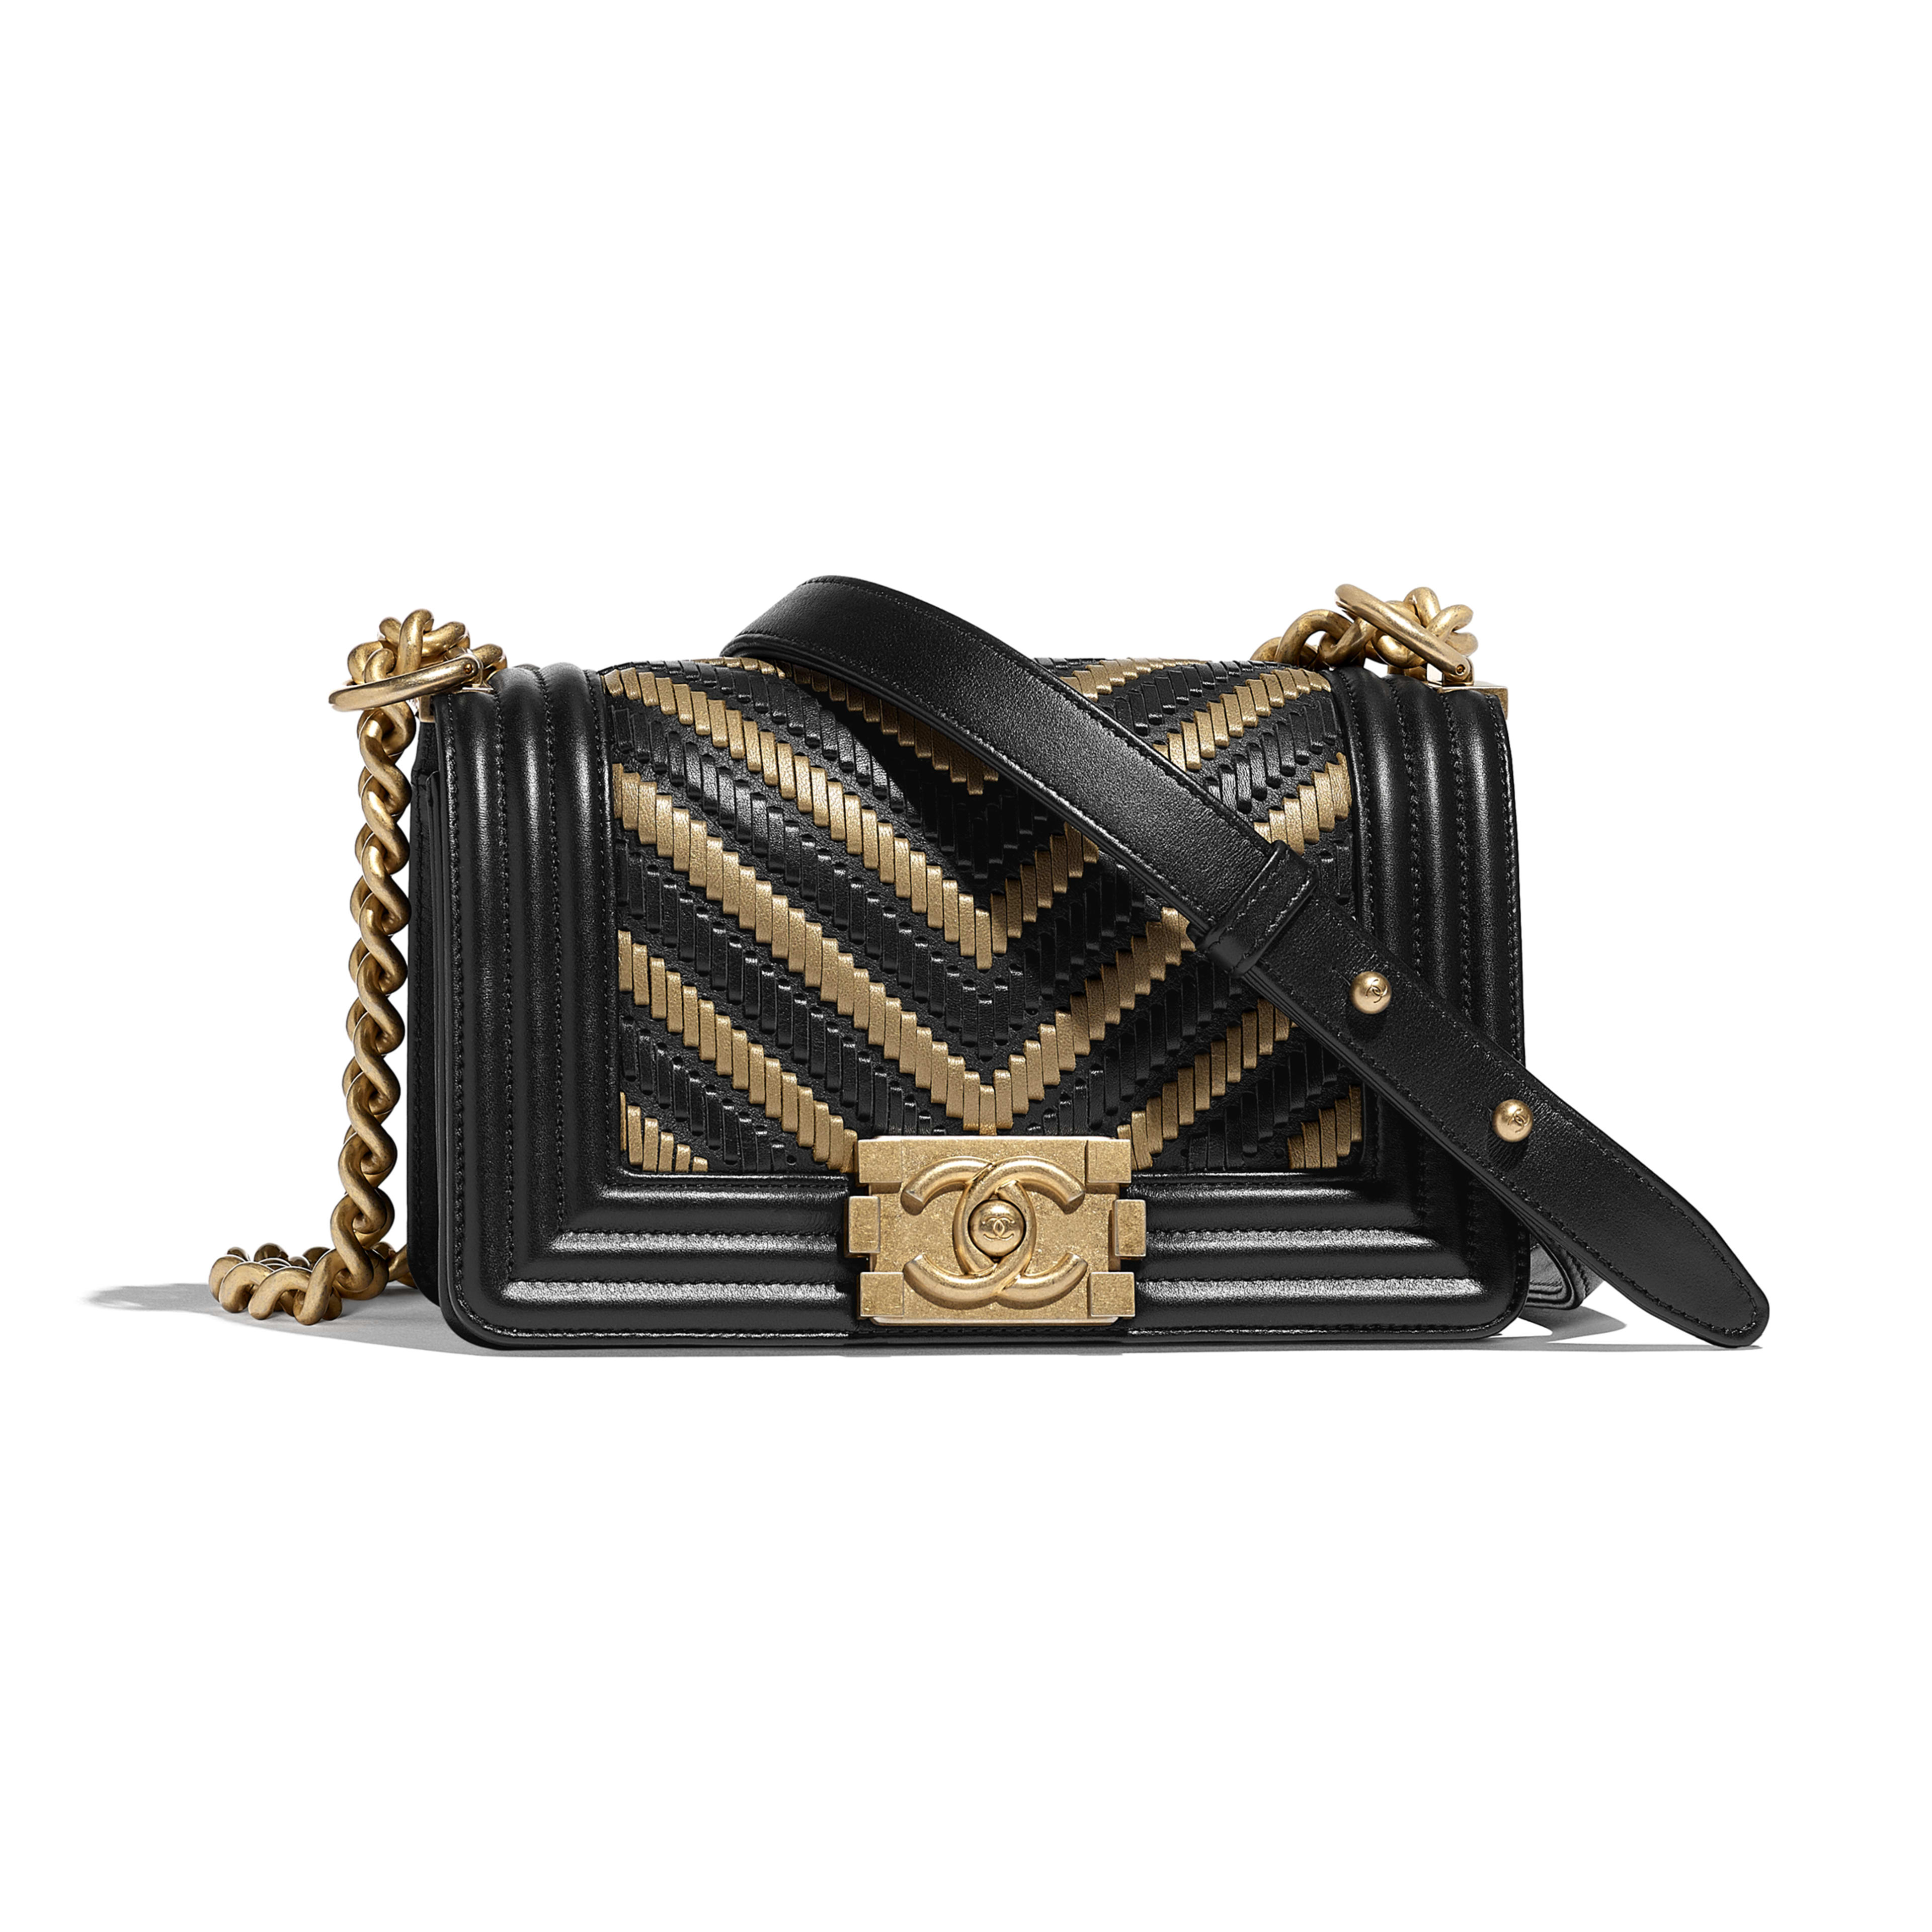 Small BOY CHANEL Handbag - Black & Gold - Metallic Lambskin, Calfskin & Gold-Tone Metal - Default view - see full sized version